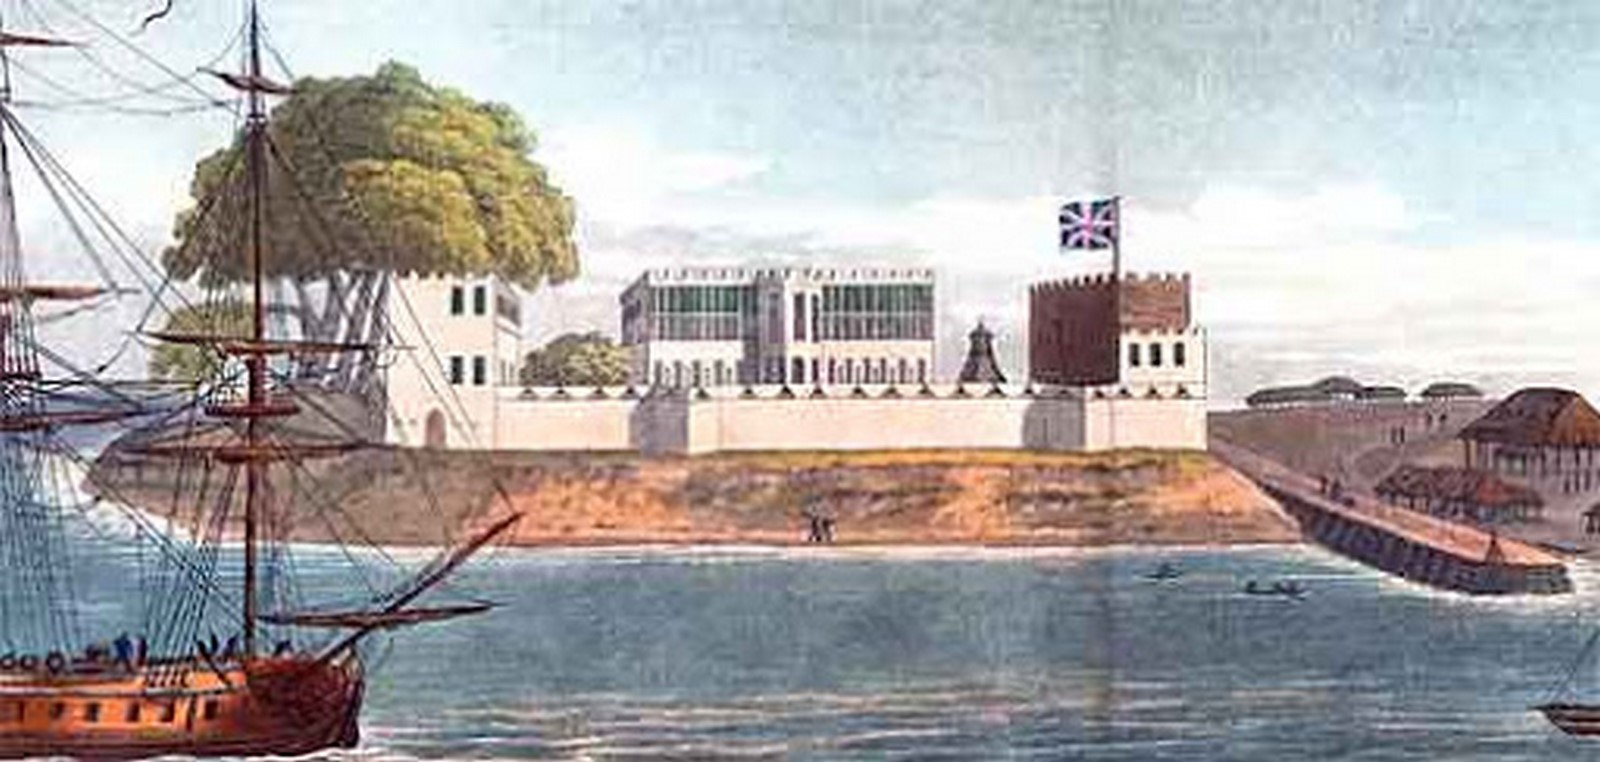 Bunce Island Slave Castle - Sheet1